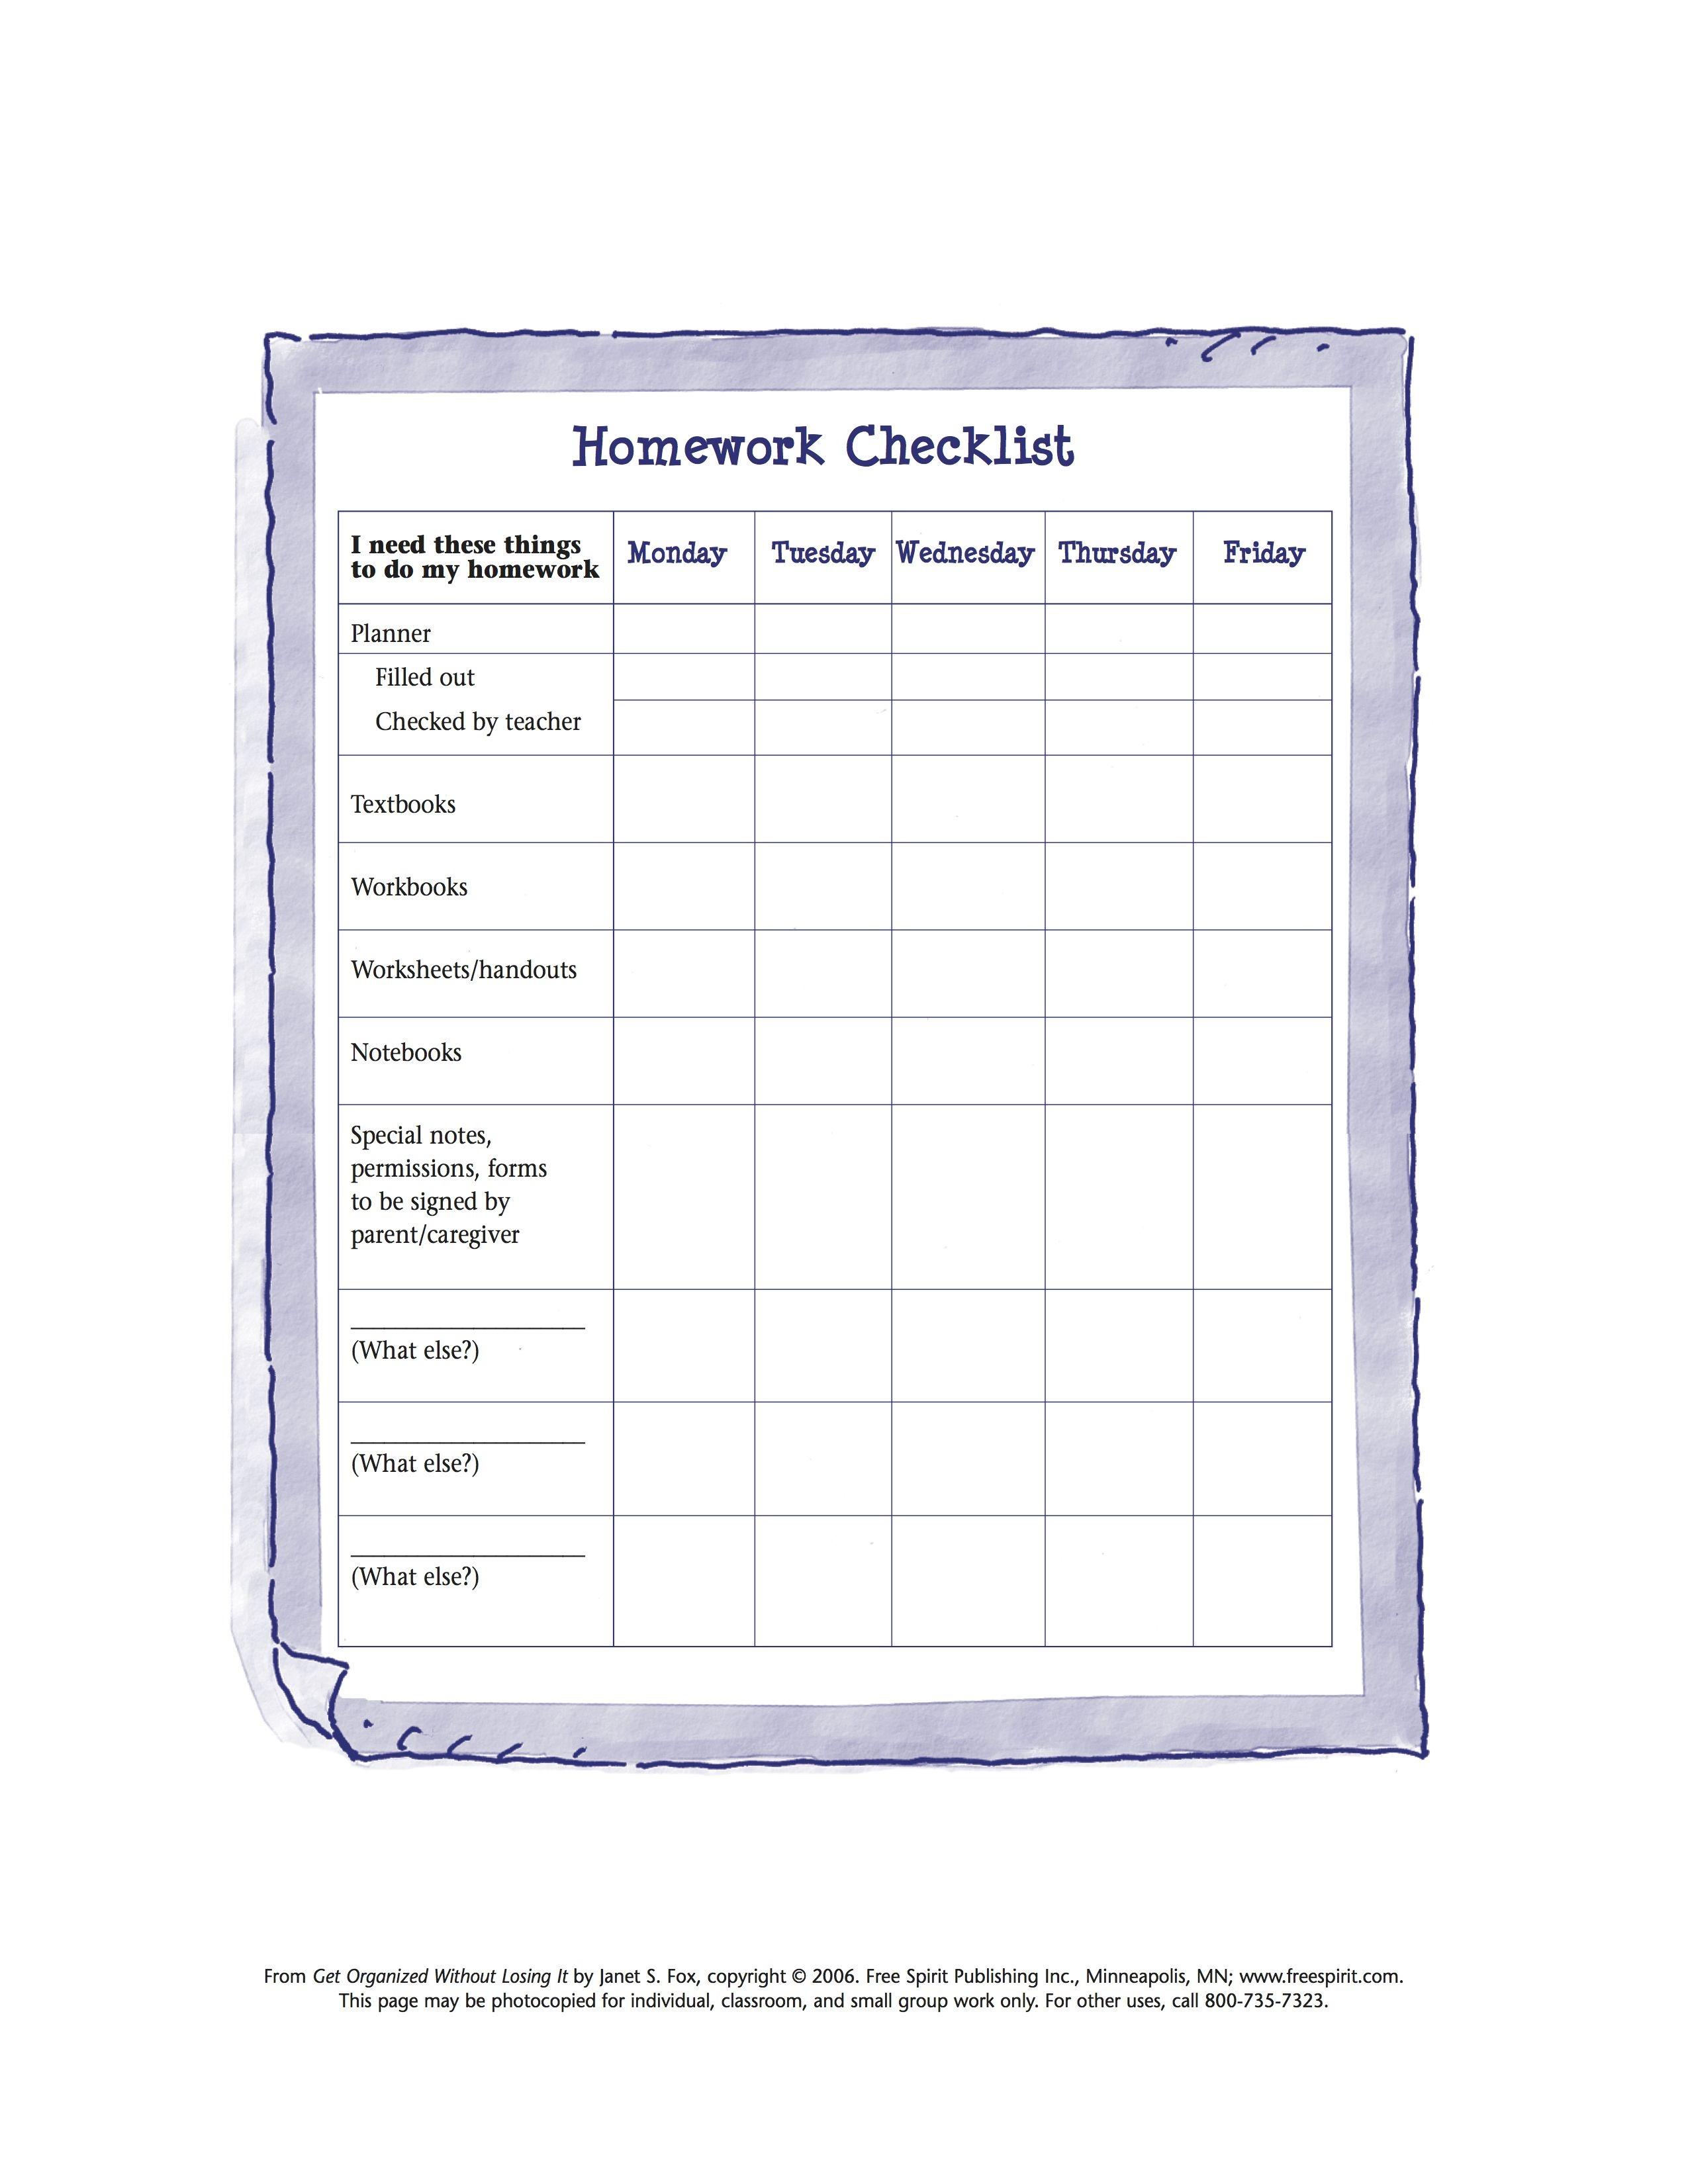 Free Printable Worksheet To Help Kids Organize Tools Needed For - Free Printable Homework Templates